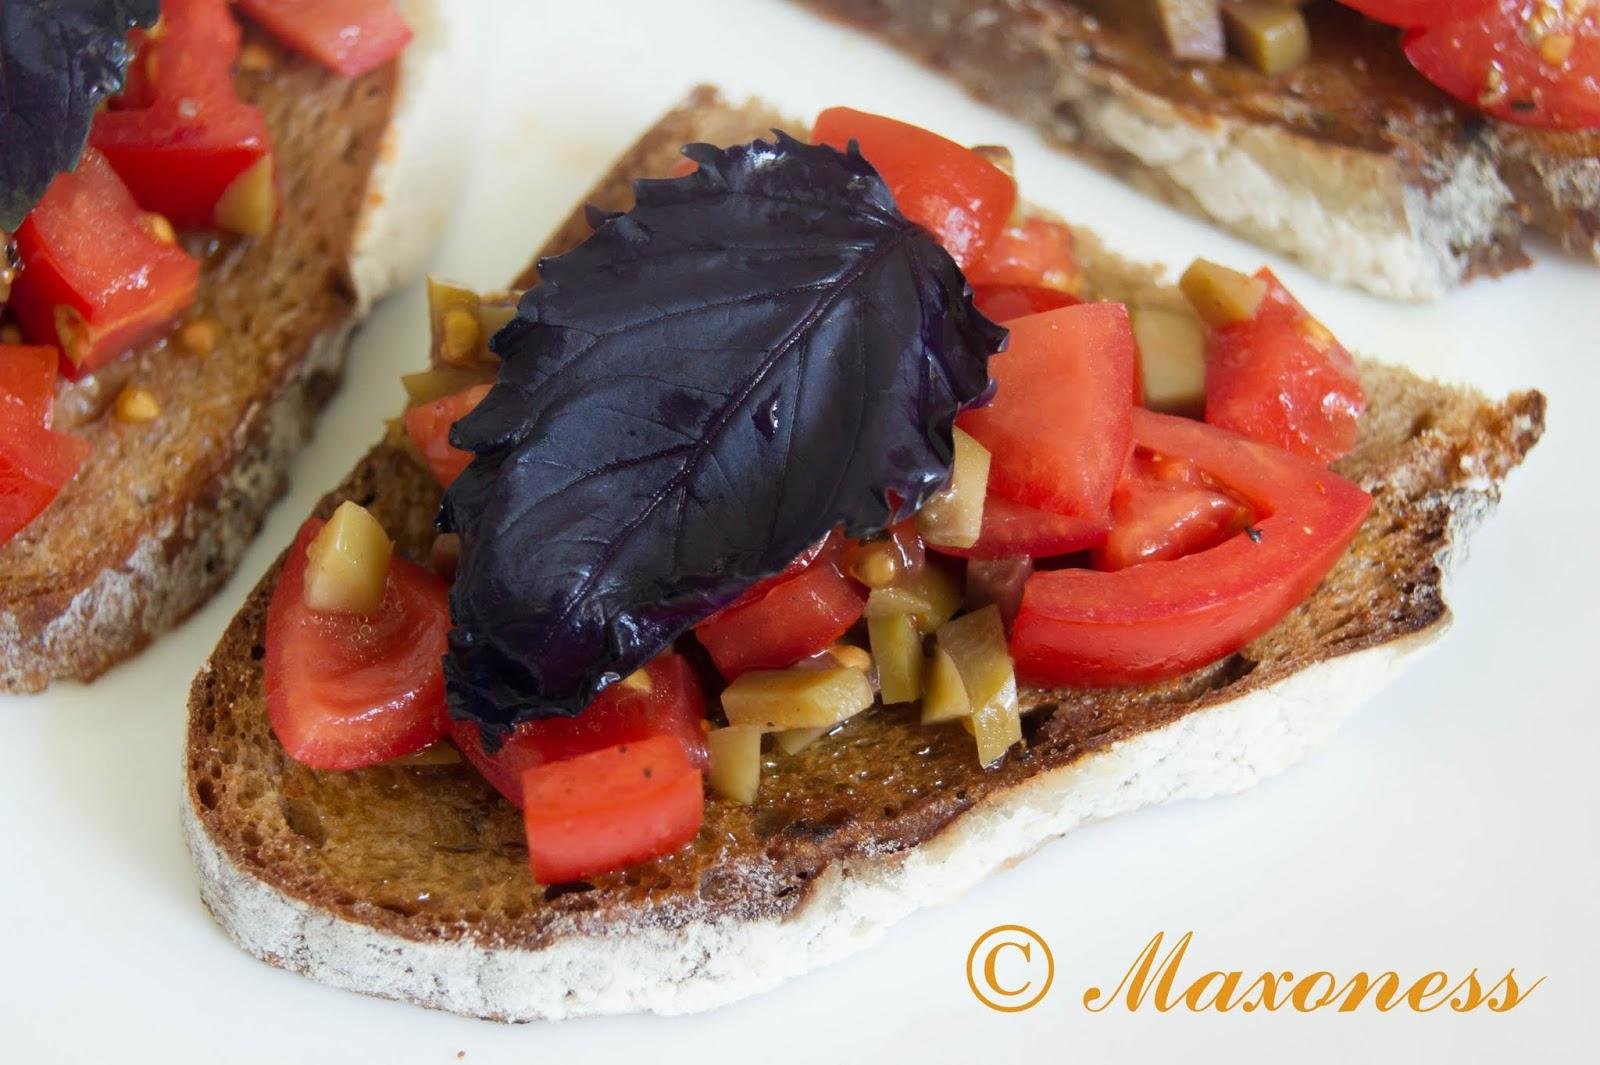 Кростини с помидорами и оливками от Джейми Оливера. Итальянская кухня.